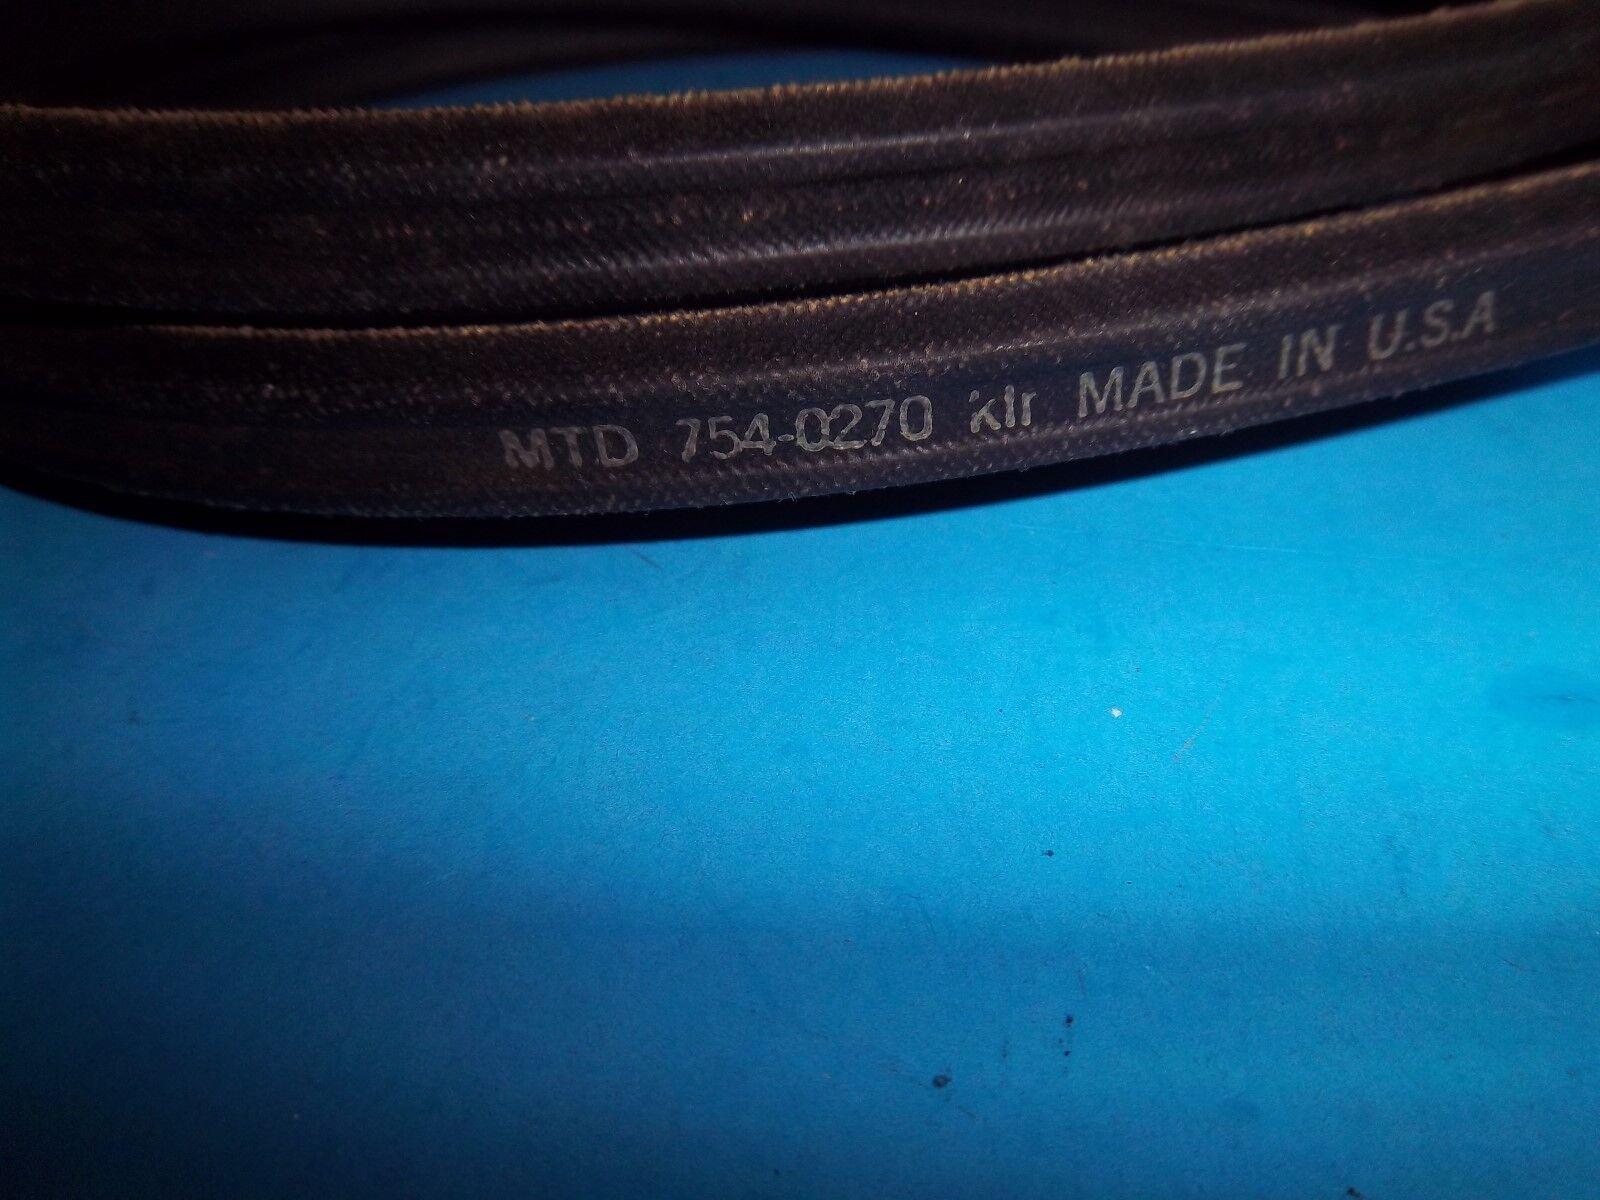 Made with Aramid Belt fits MTD Cub Cadet 754-0143